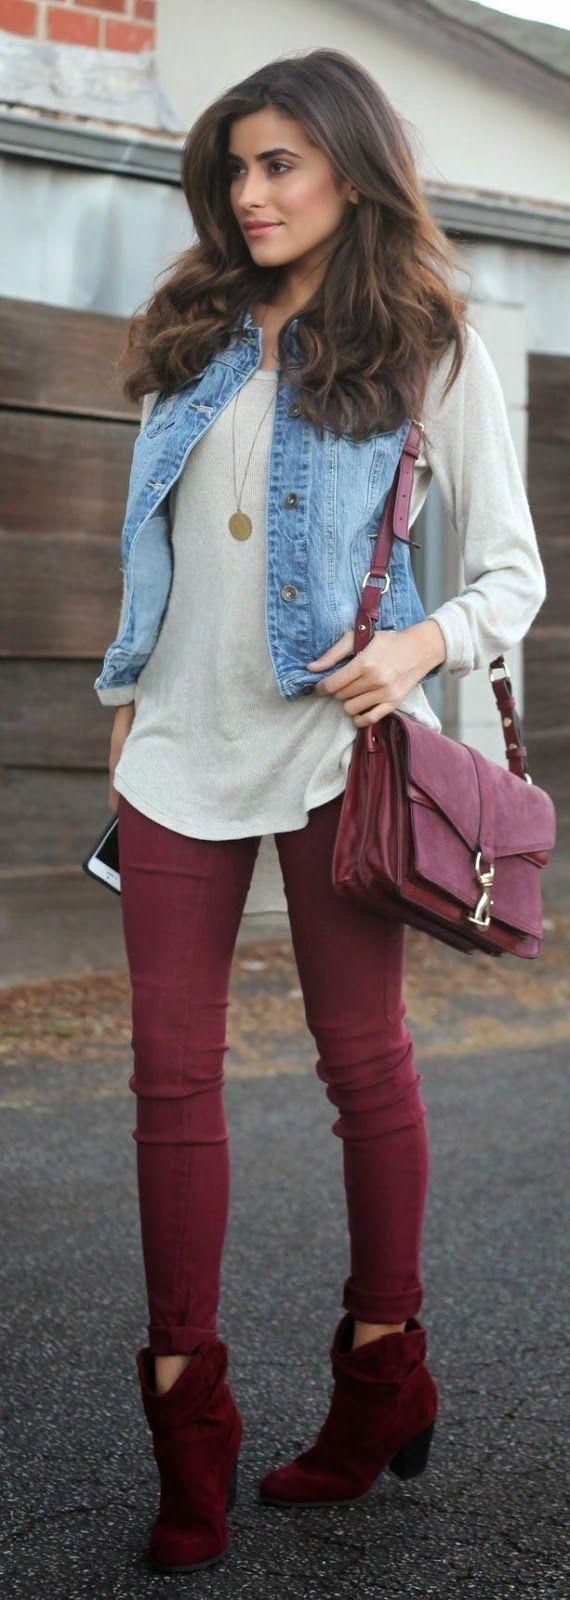 Fashion & Style Outfits 2015. Contrast colour combinations & Latest Trending Clothes. https://tvcmatrix.com/ShanekaJones